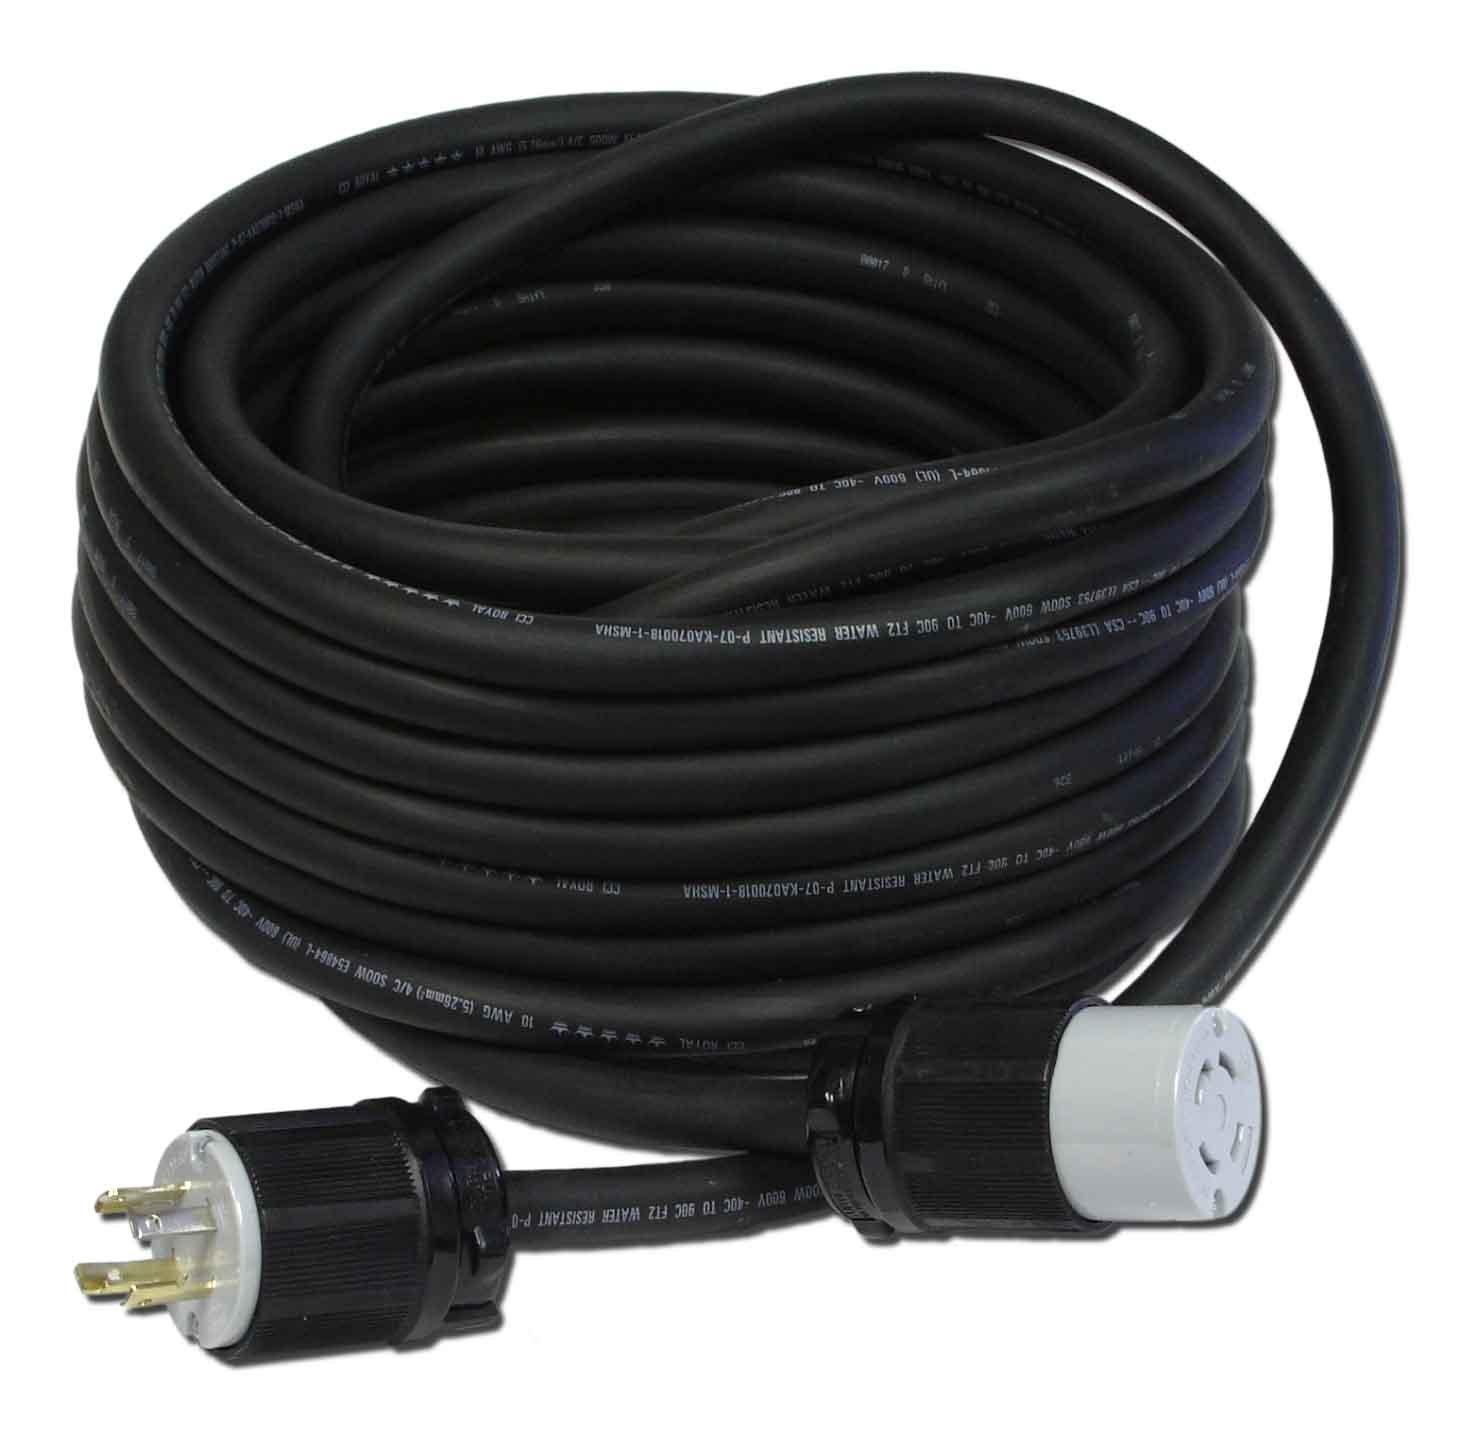 Powertronics Connections NEMA L14-30 50' cord 50-Feet 30-Amp L14-30 Generator Power Cord for Upto 7500-watt Generators